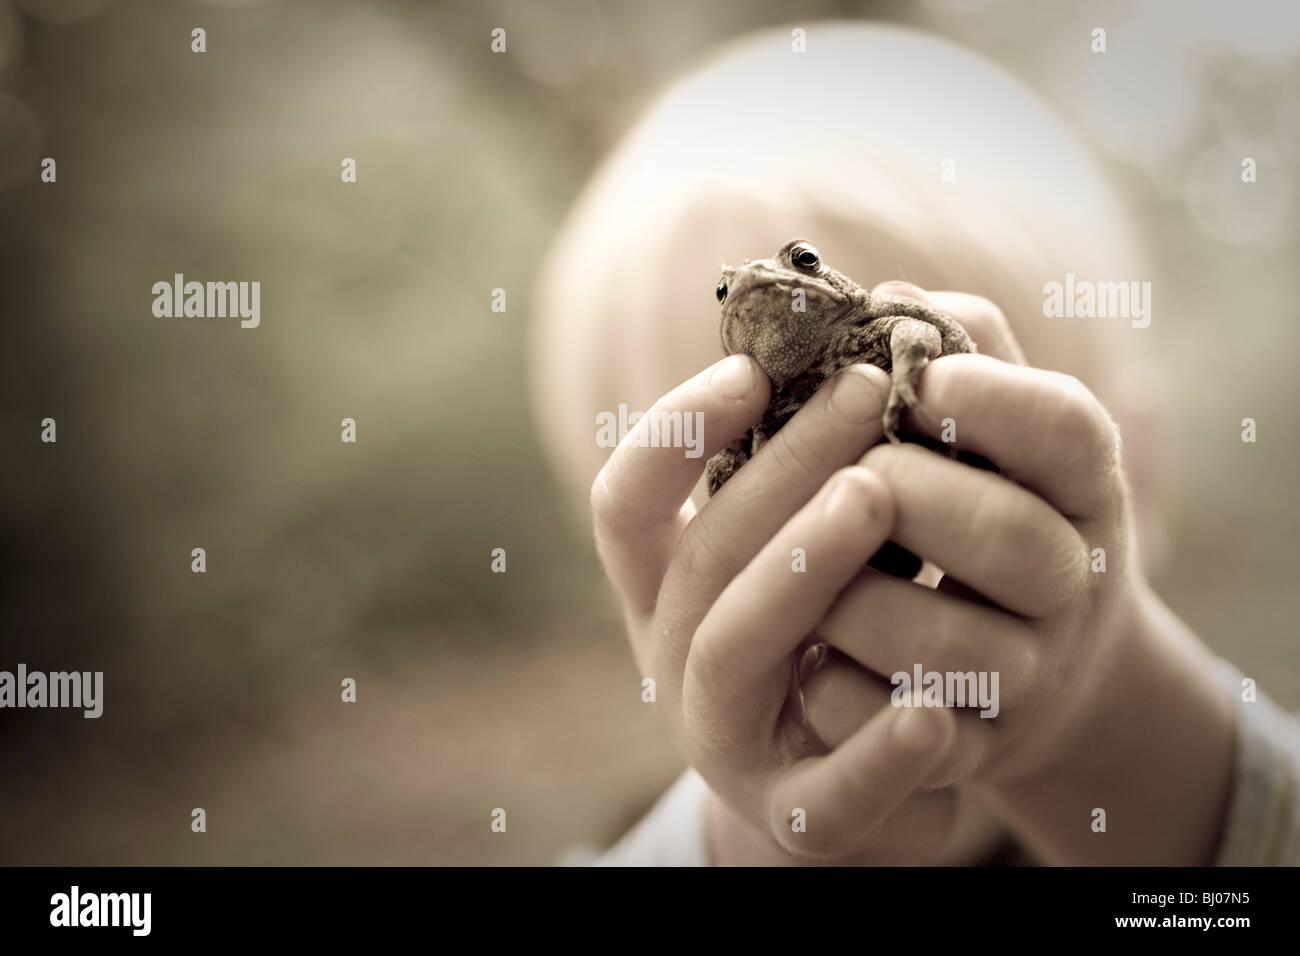 Jeune enfant tenant une toad. Photo Stock